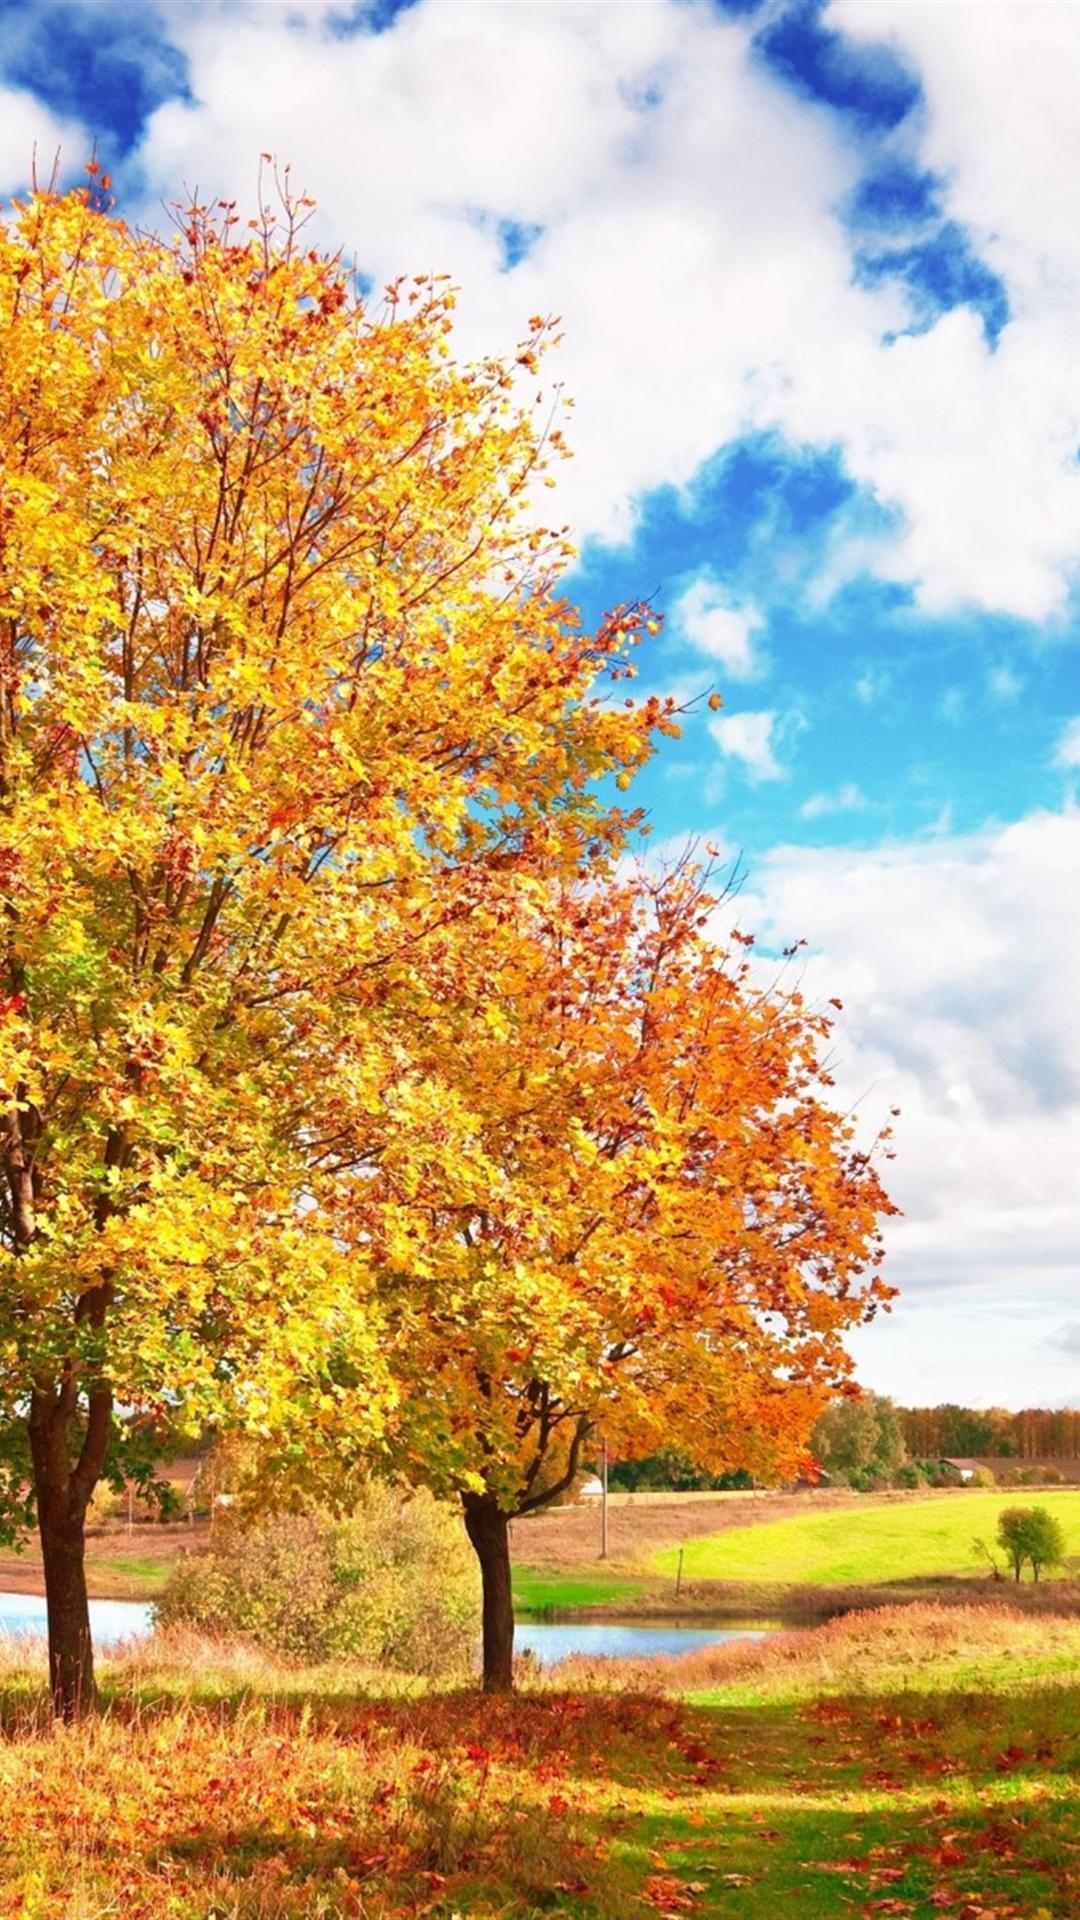 Fall Leaves Ipad Wallpaper Fall Iphone Wallpapers Pixelstalk Net